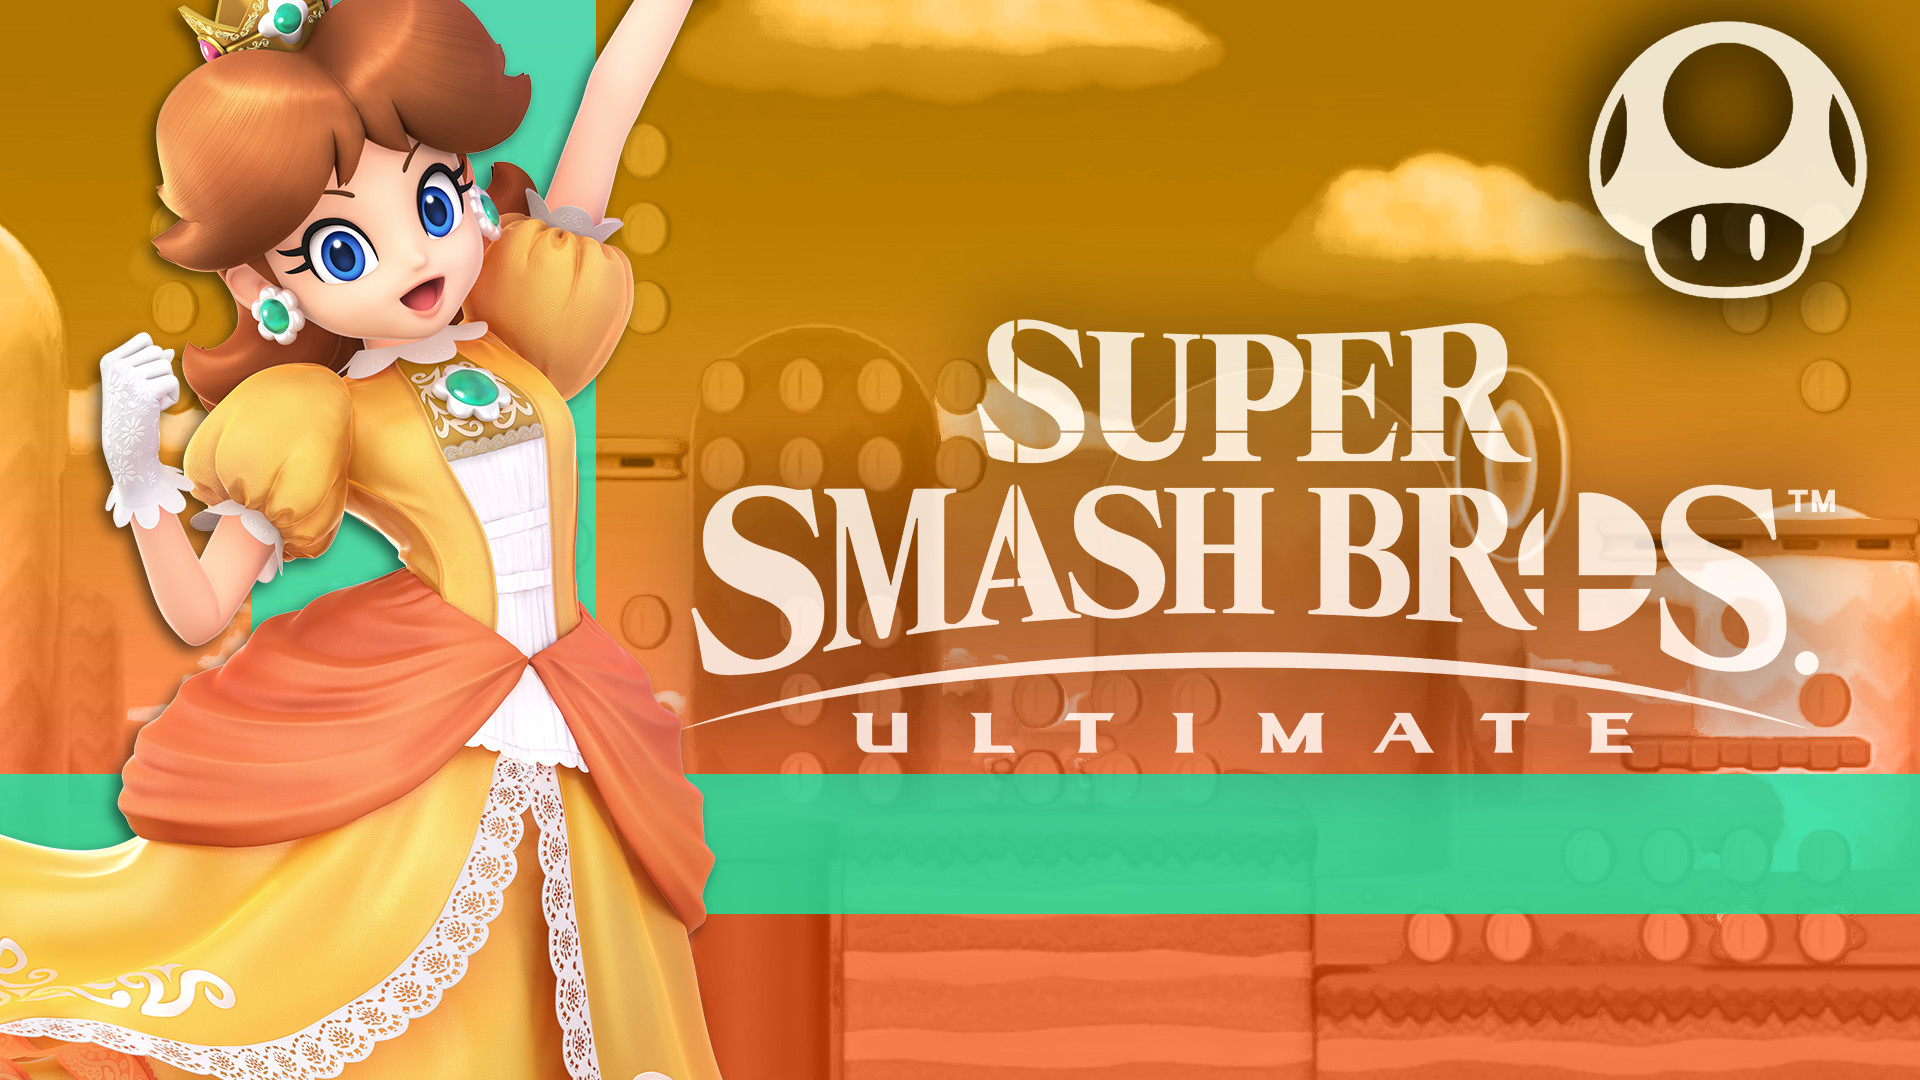 1920x1080, Princess Daisy - Snake Super Smash Bros Ultimate - HD Wallpaper